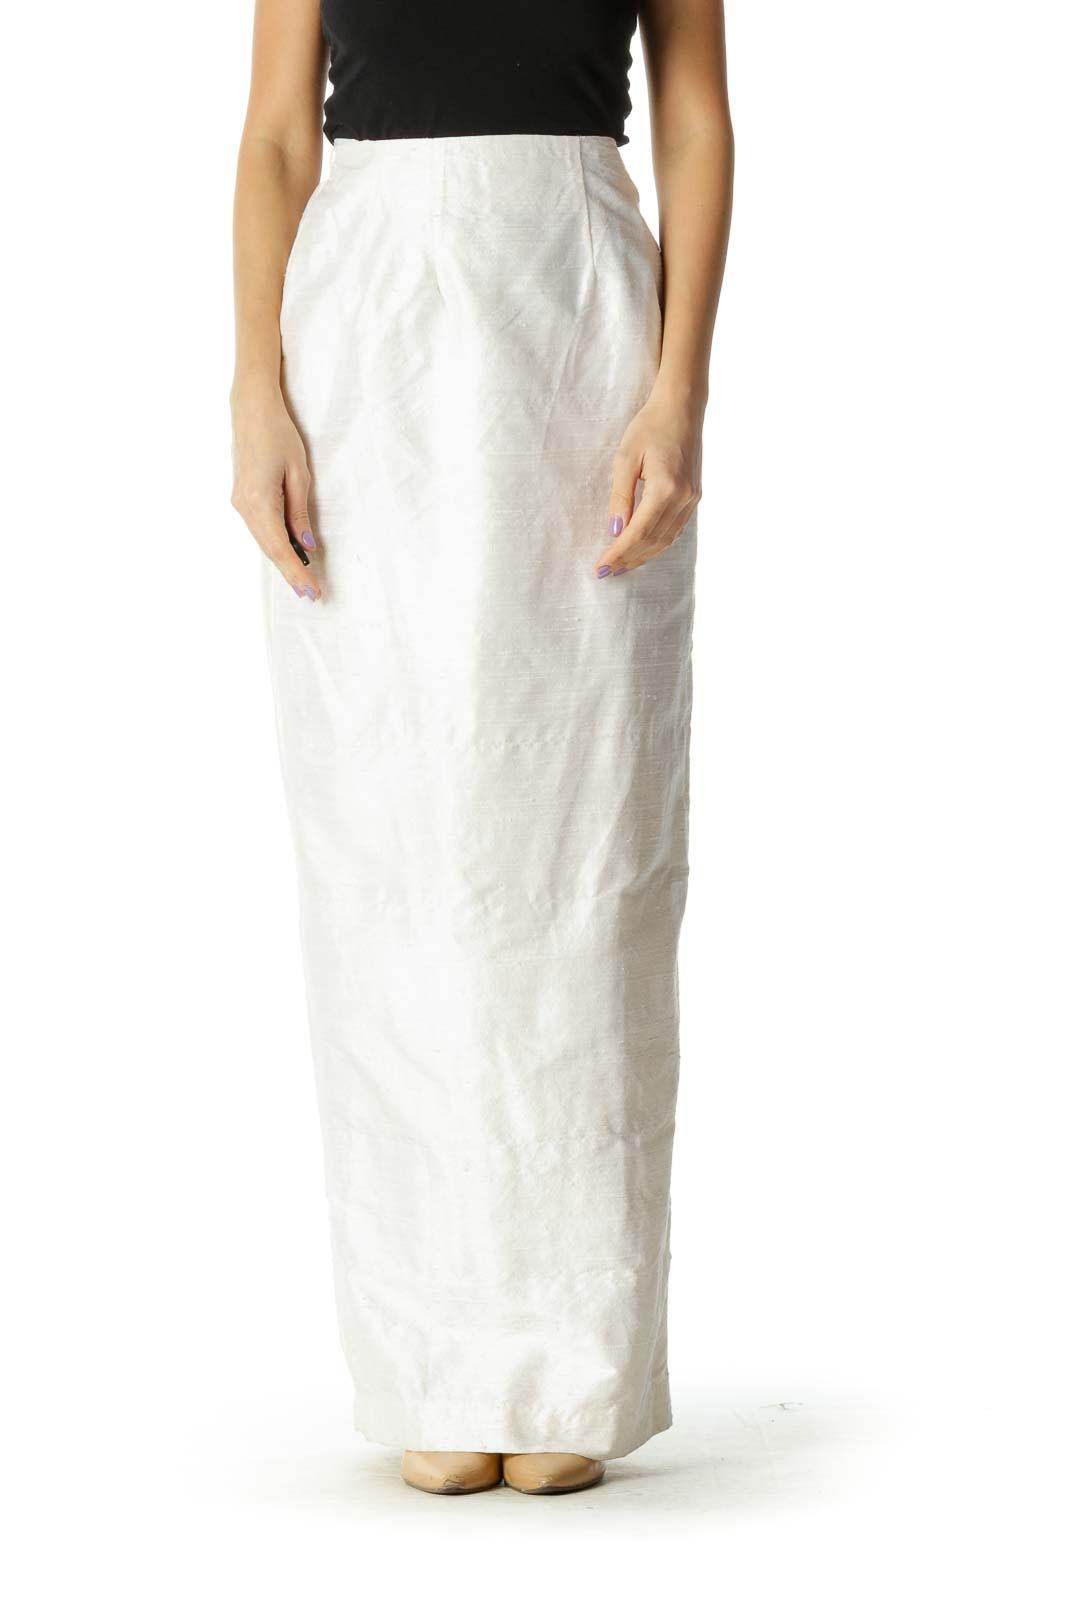 White Solid Brunch Straight Skirt Front